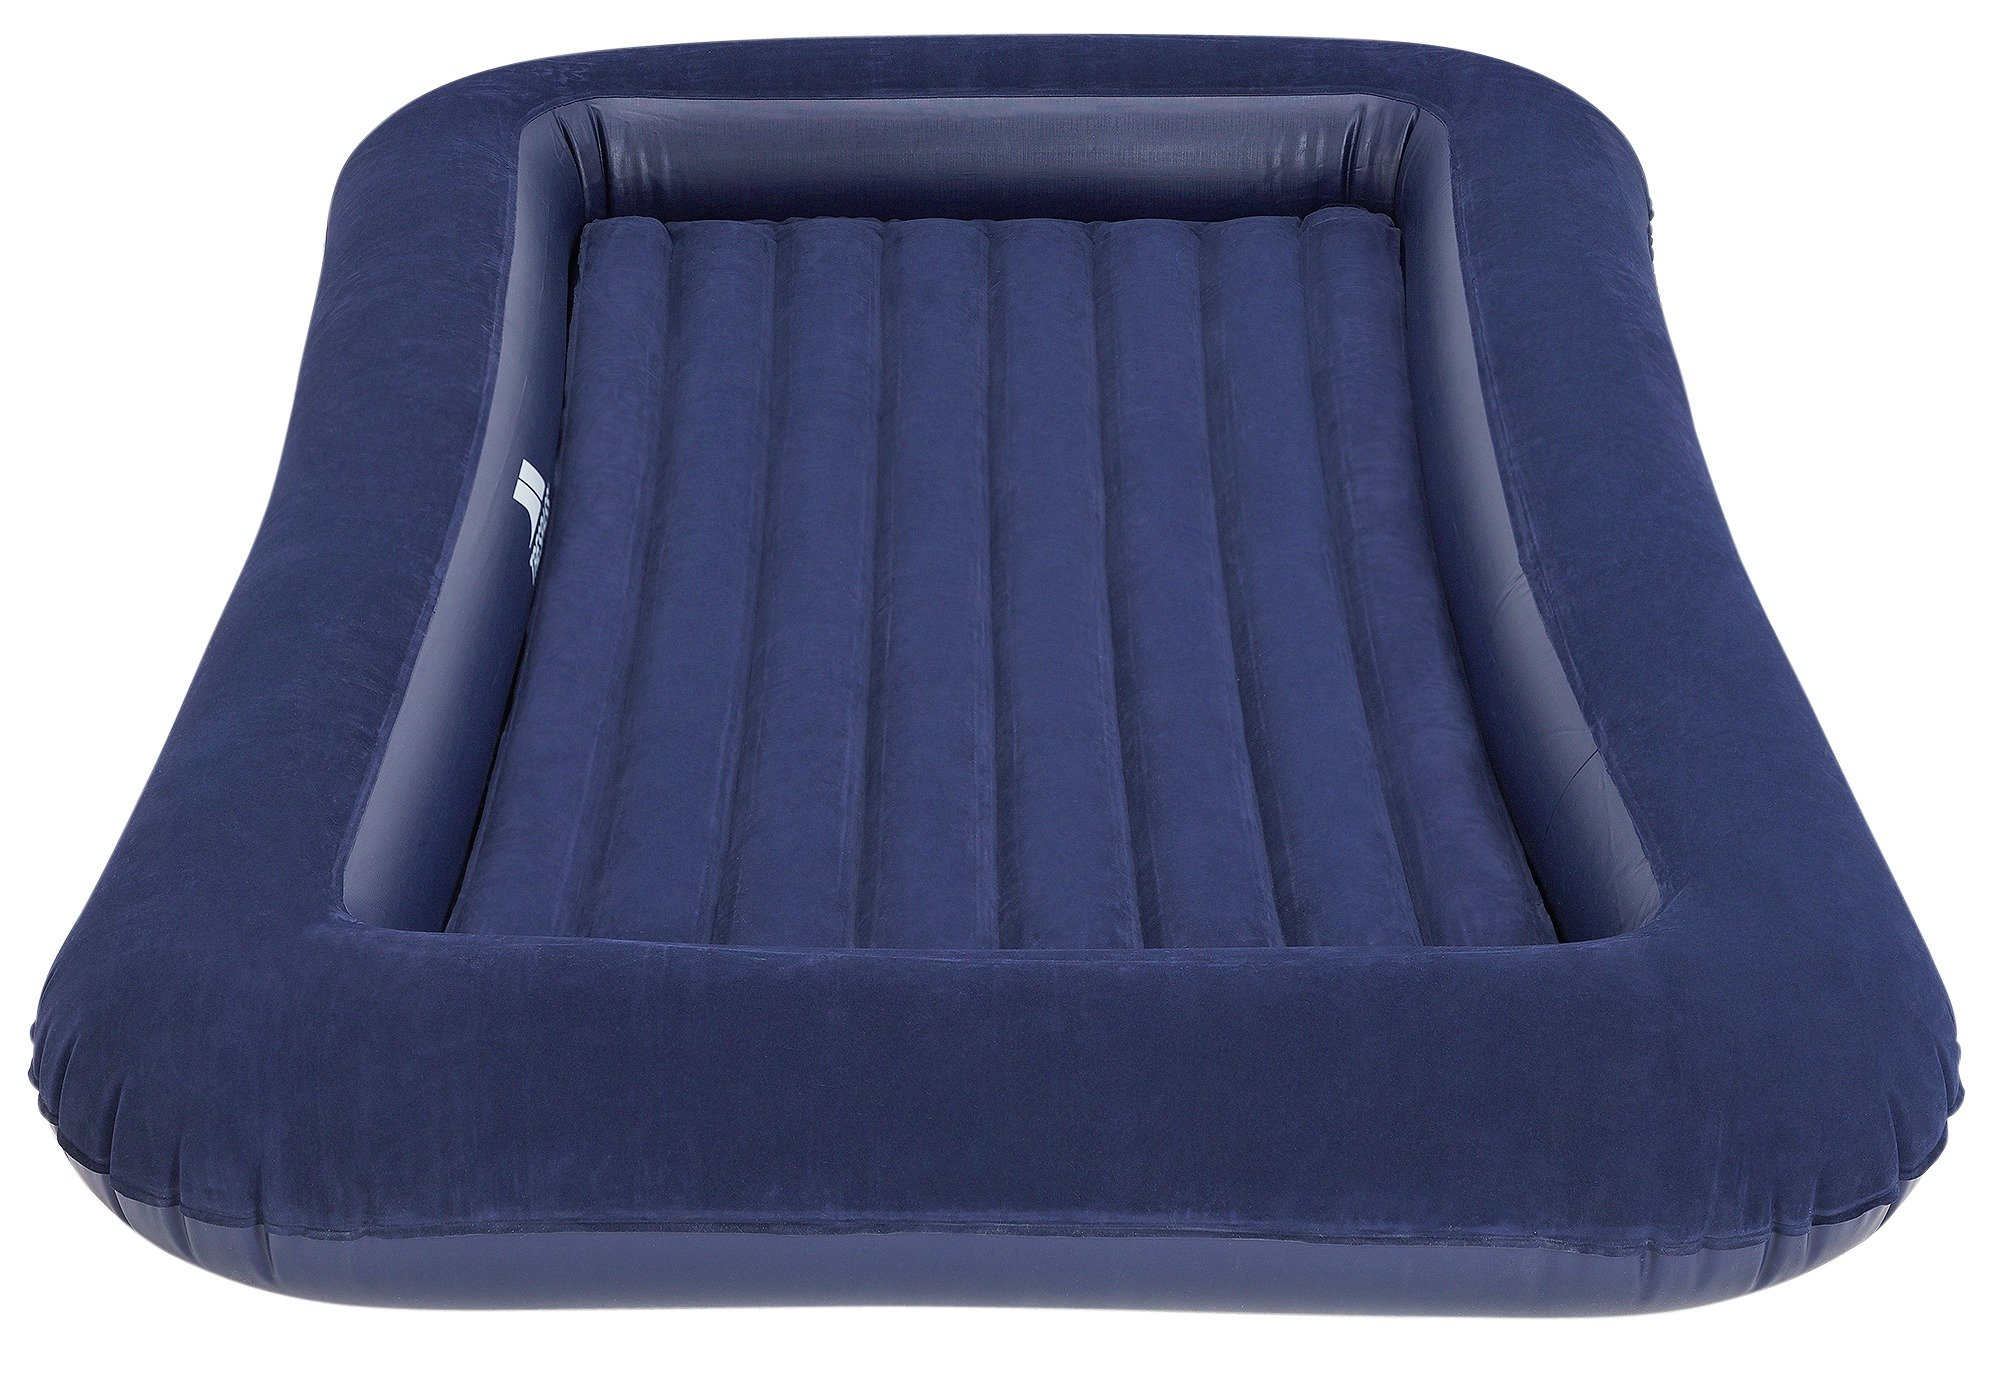 air mattress with sides Buy Trespass Junior Air Bed | Air beds | Argos air mattress with sides